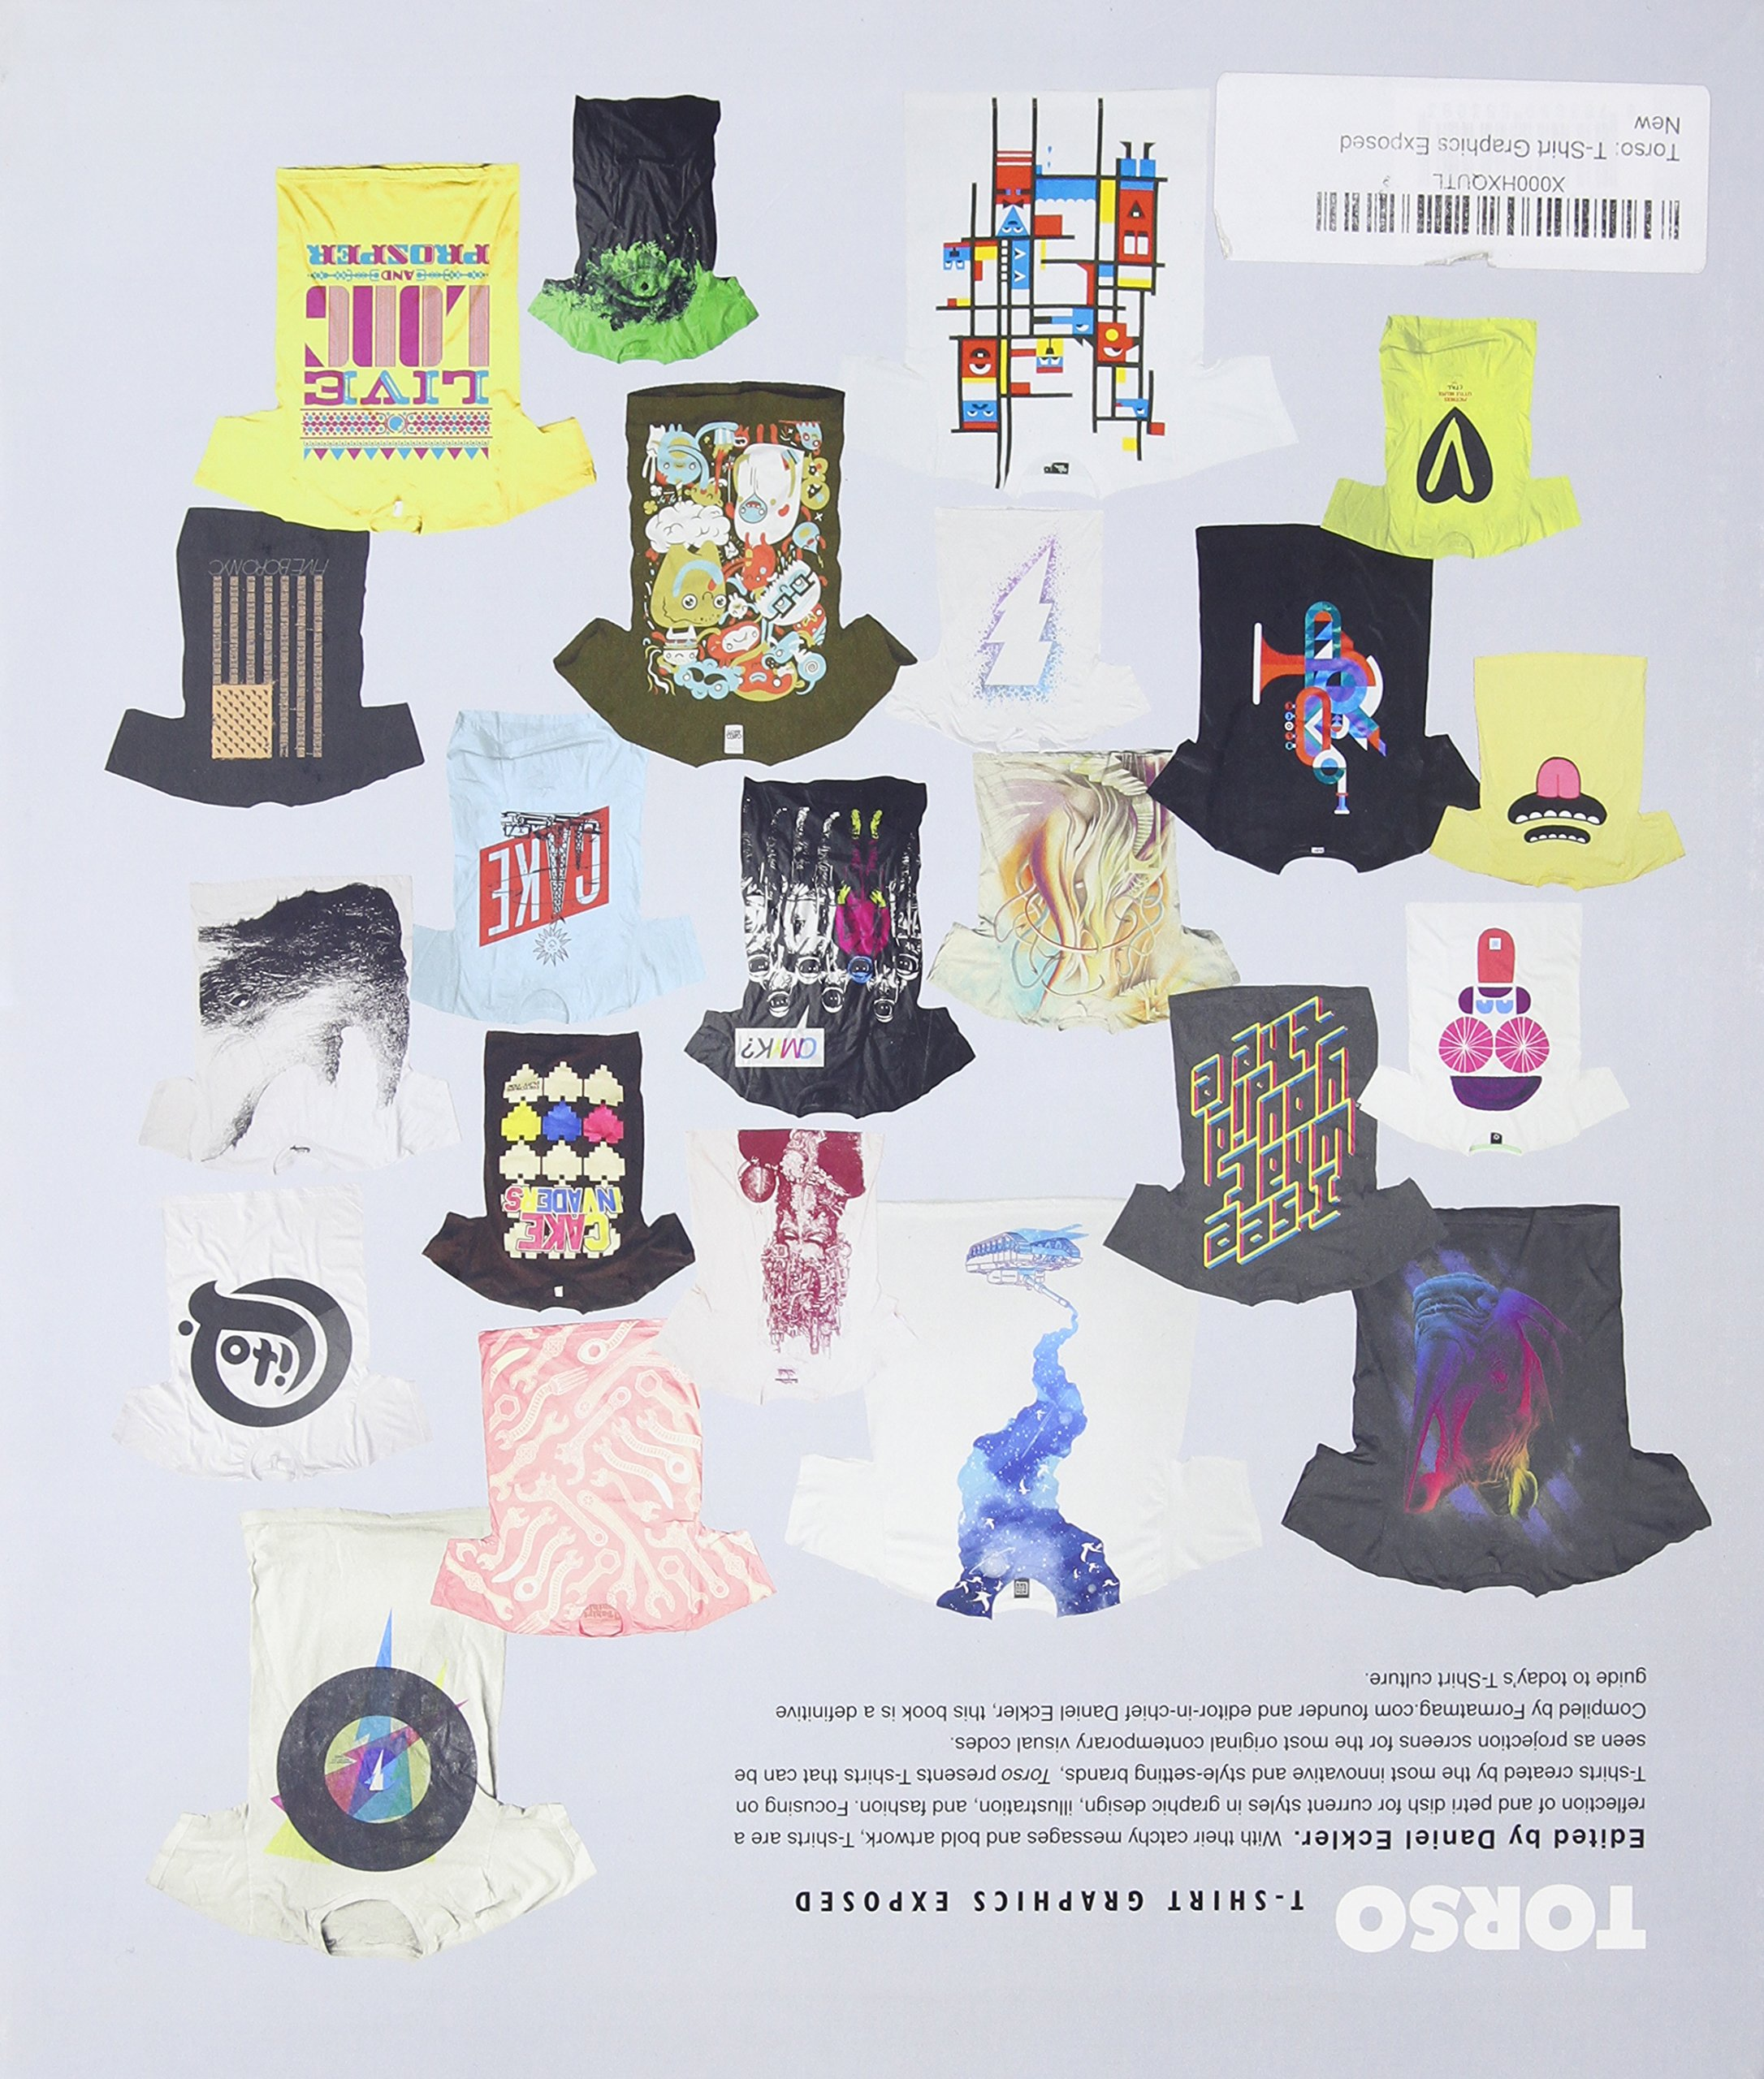 T shirt design 2 zeixs - Torso Streetwear T Shirt Graphics Exposed Amazon De Daniel Eckler Fremdsprachige B Cher